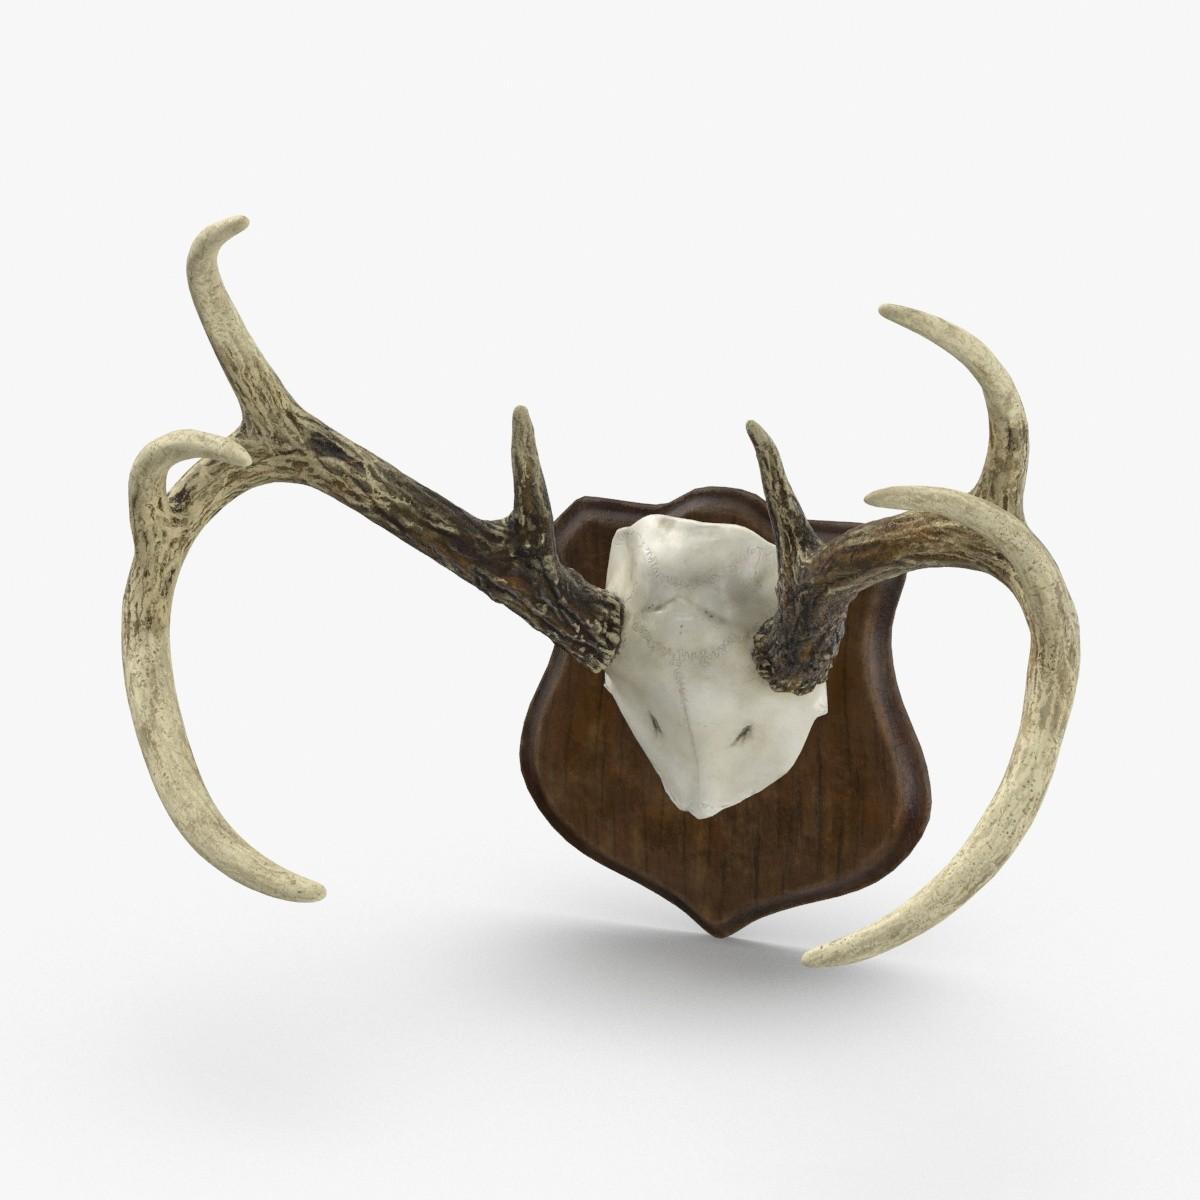 mounted-antlers-02 model